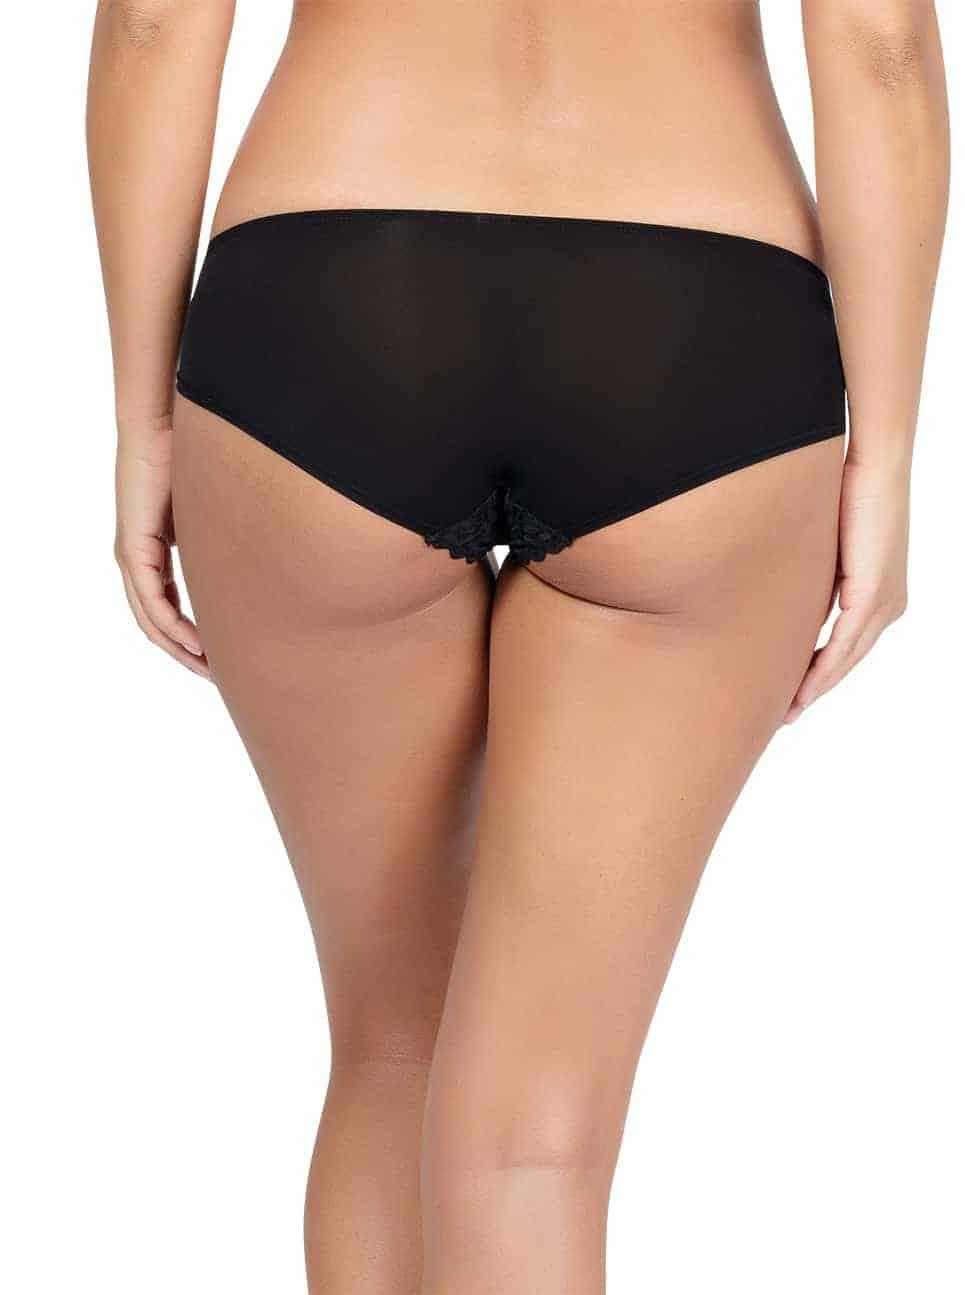 PARFAIT Adriana BikiniP5483 Black Back - Adriana Bikini - Black - P5483